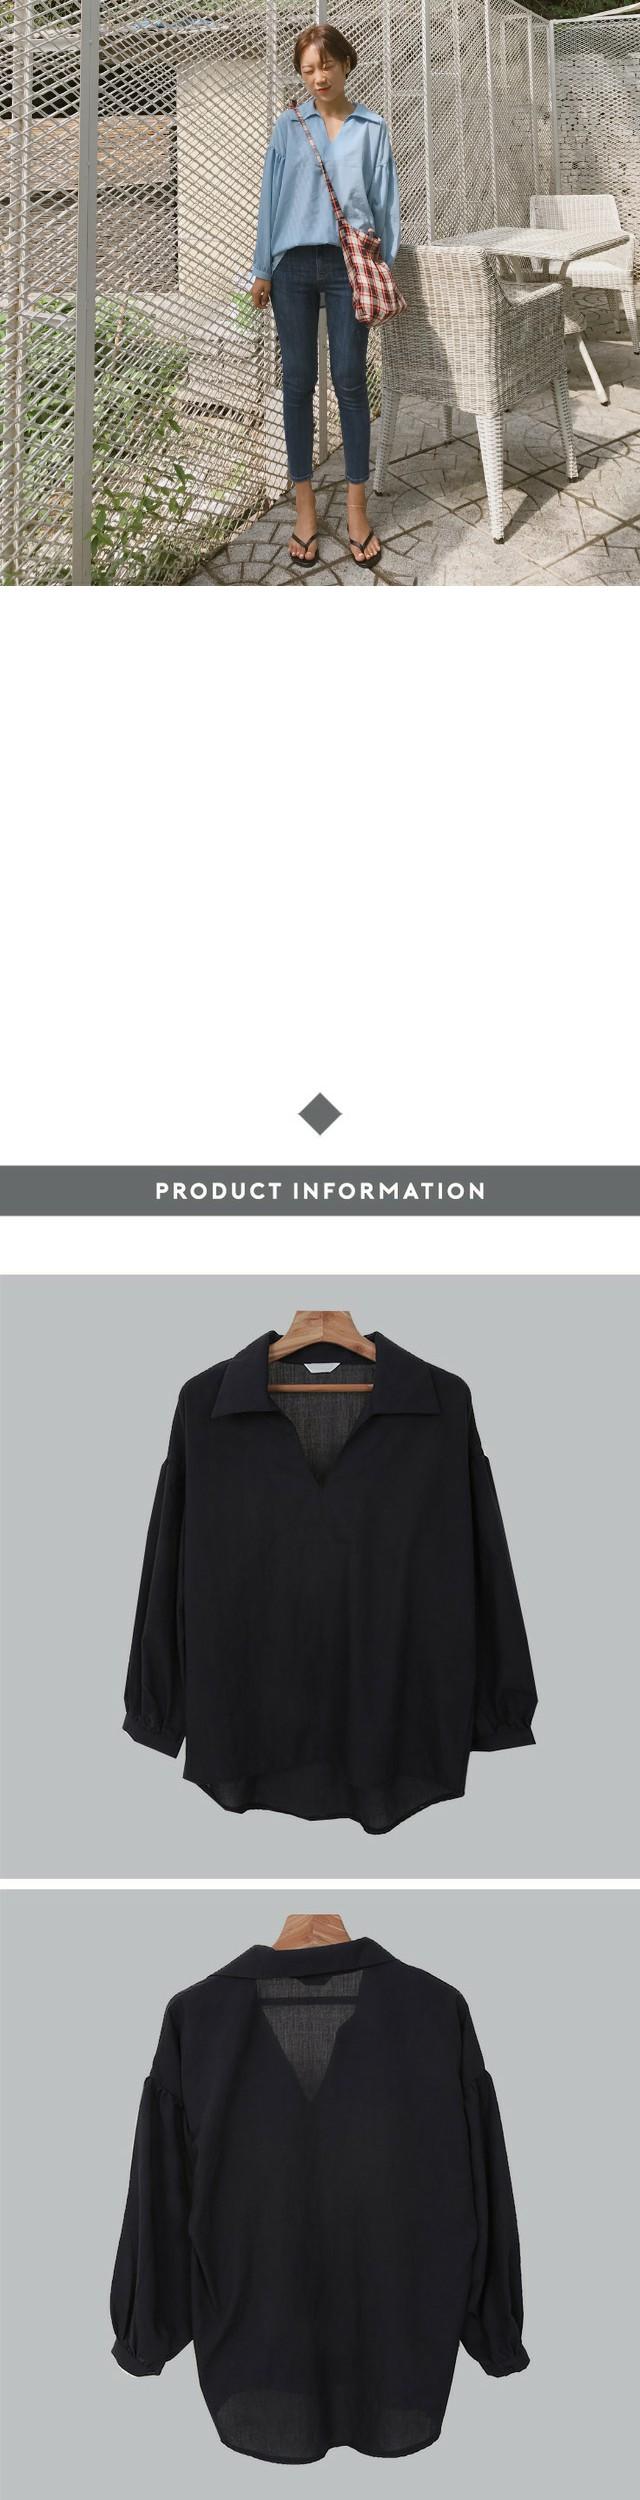 Windy-blouse